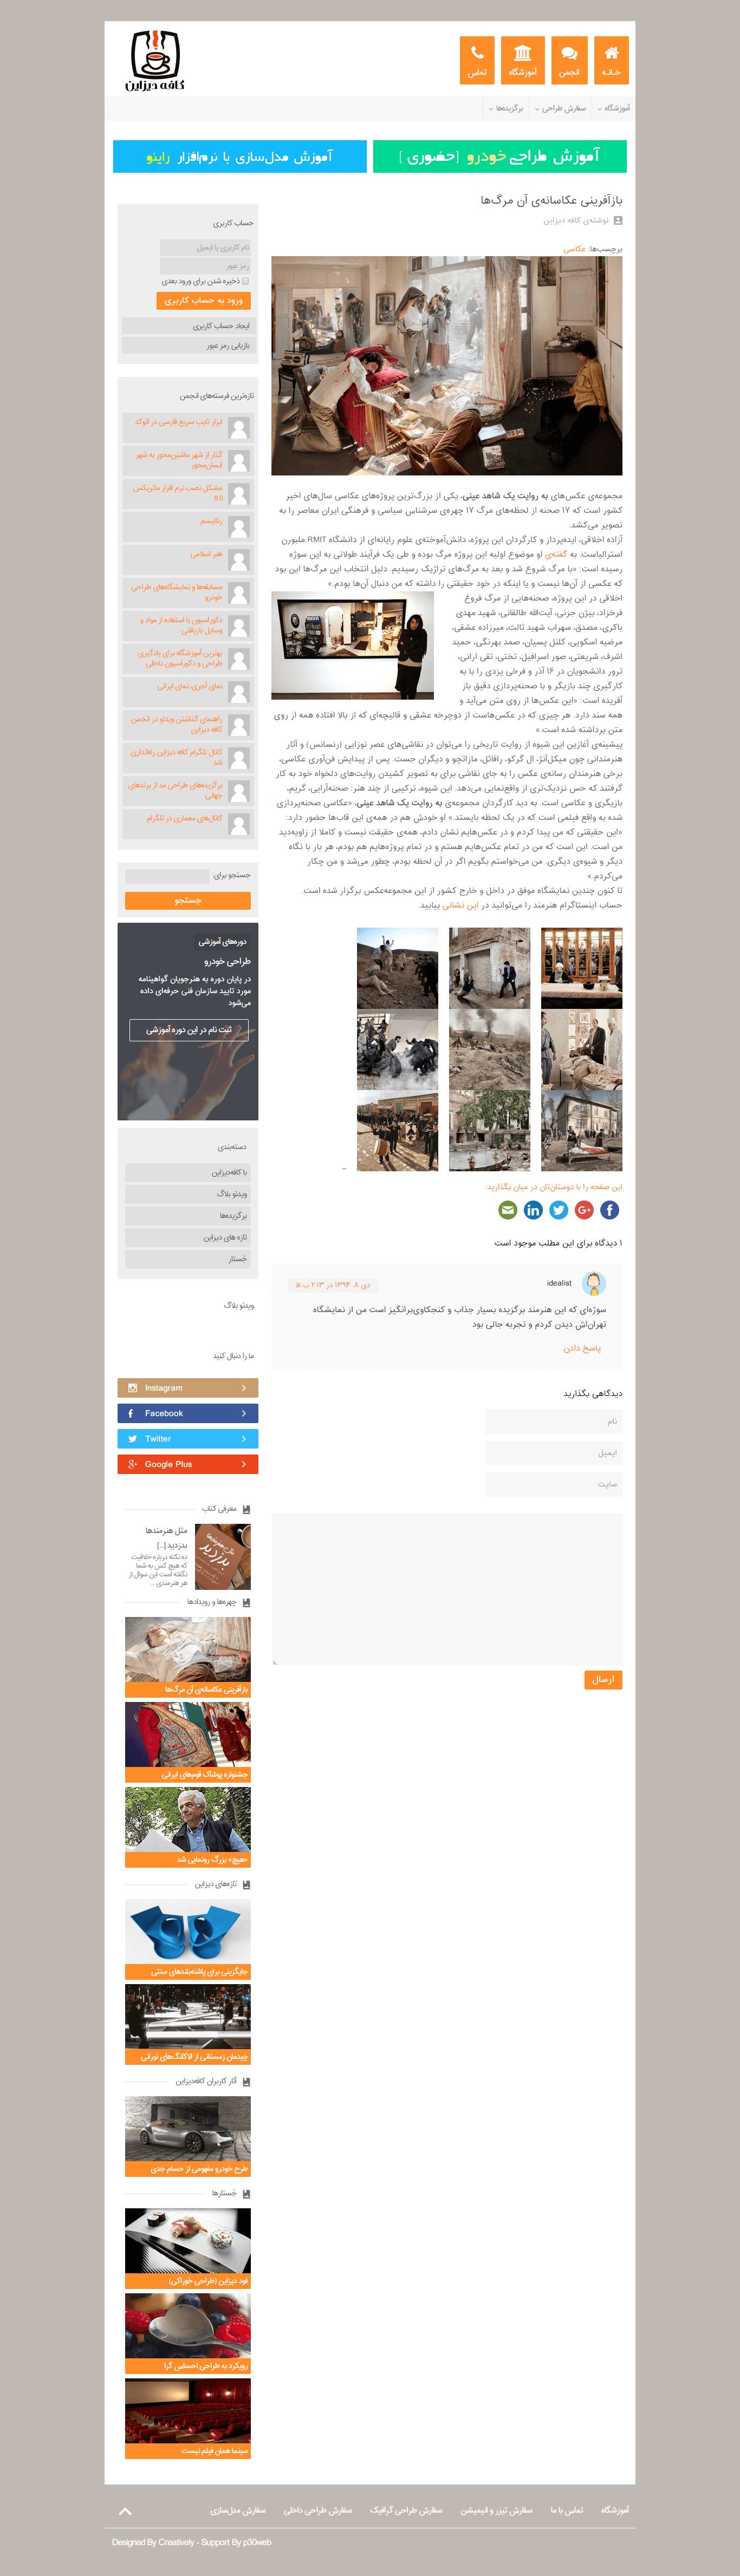 طراحی قالب وردپرس کافه دیزاین